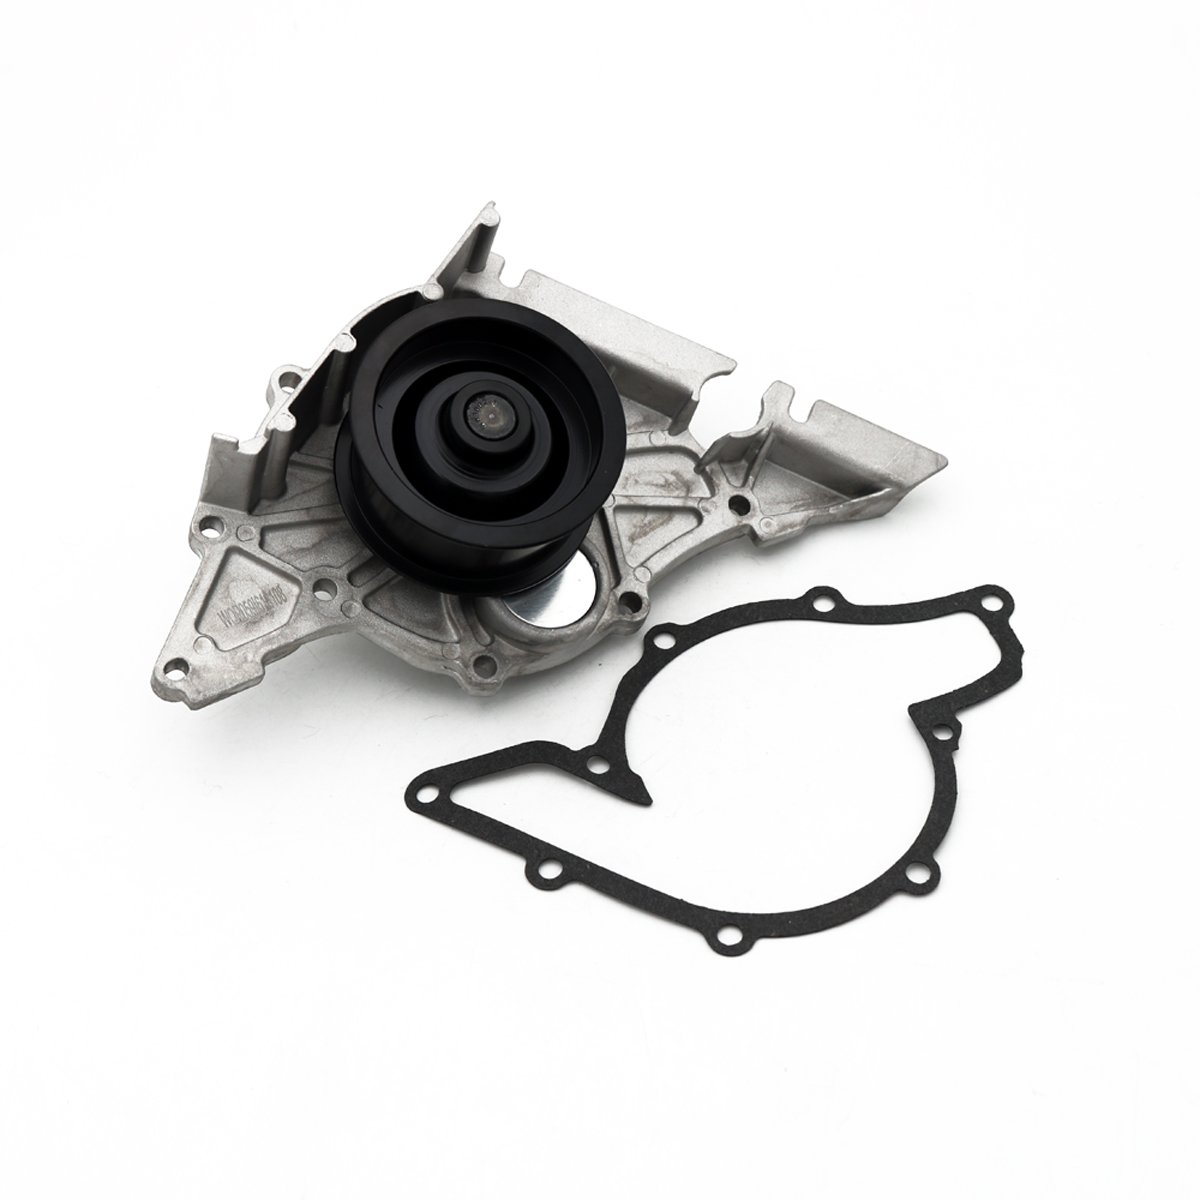 Fits Timing Belt Kit Water Pump Tensioner for 1998-2005 Audi A4 A6 VW Passat 2.8L V6